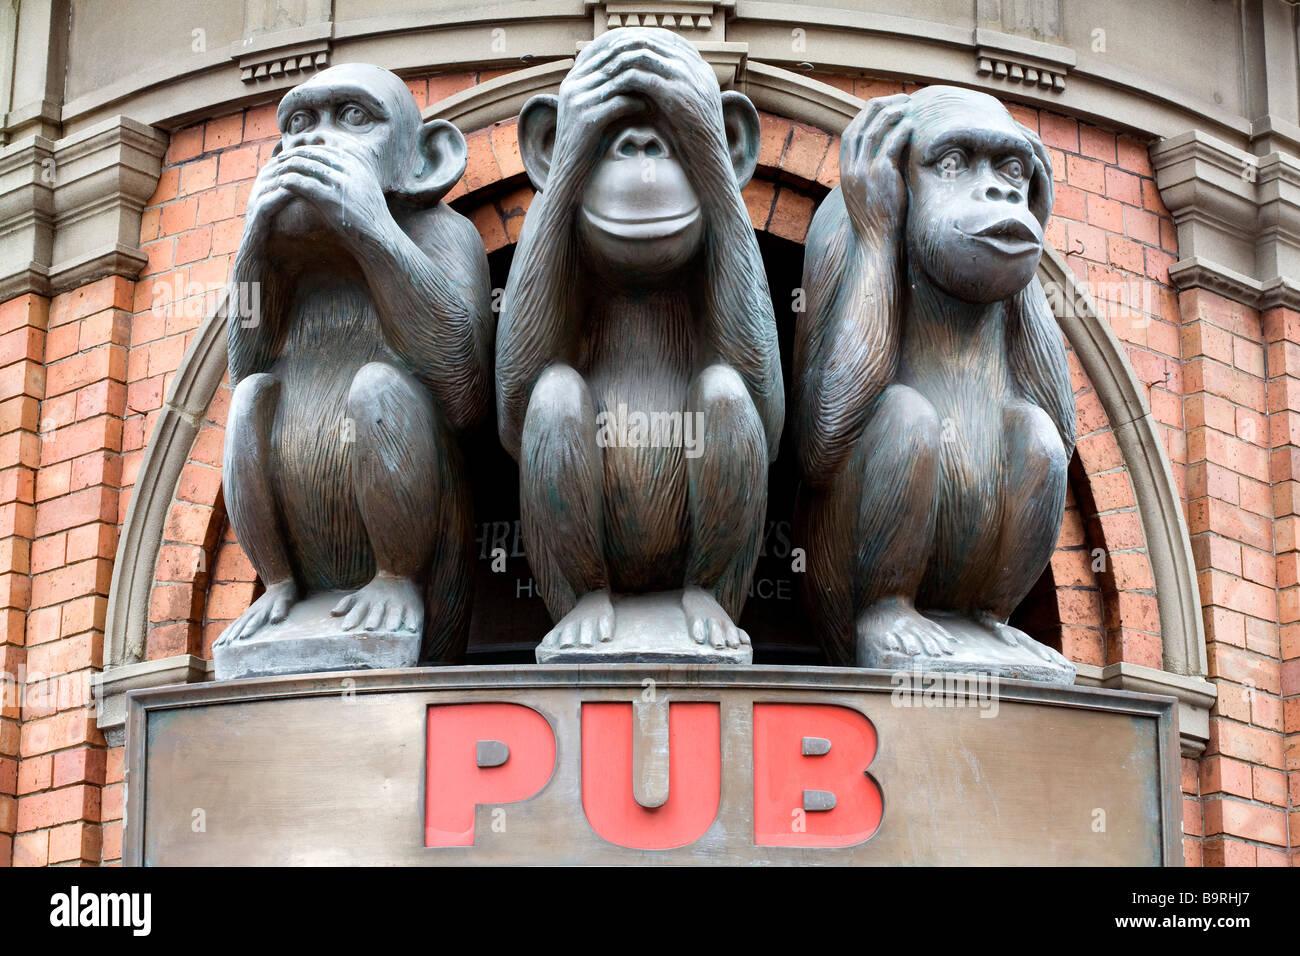 Three wise monkeys wooden ornaments - Australia New South Wales Sydney George St The Three Wise Monkeys Pub